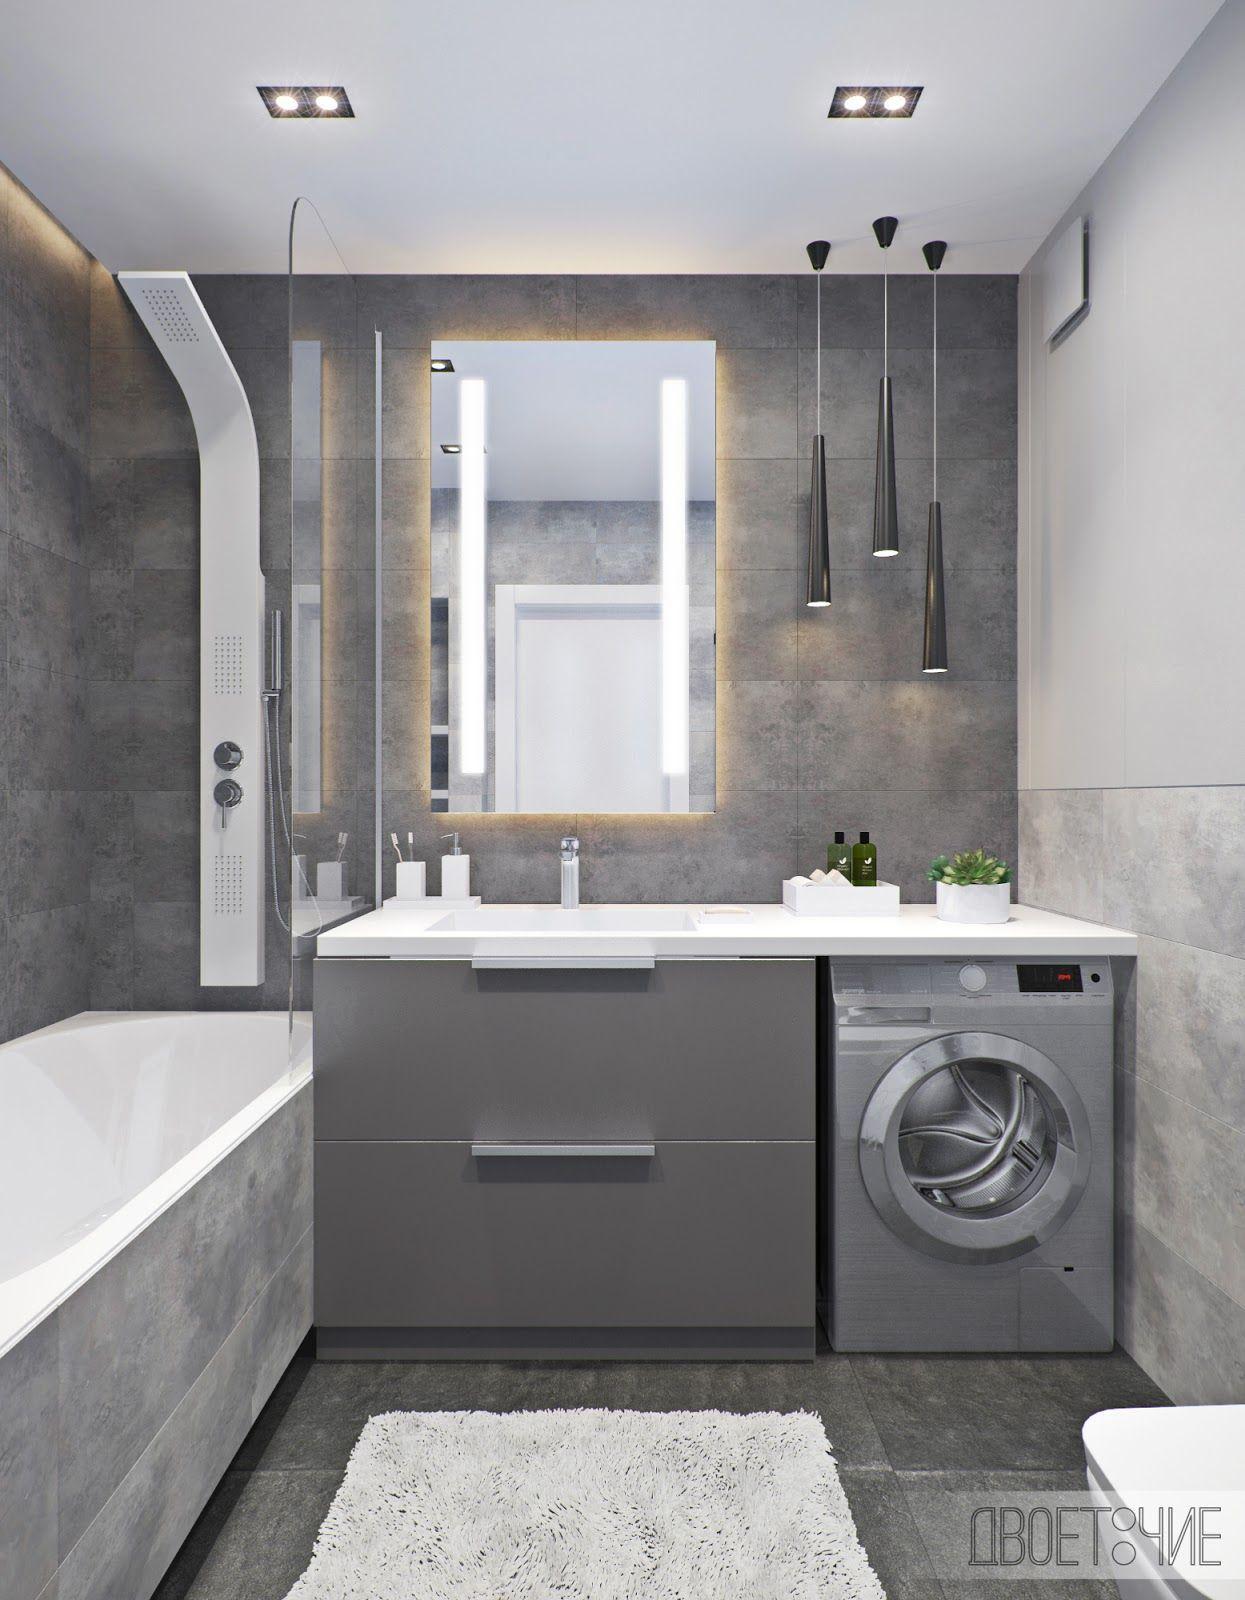 Dyi Bathroom Remodel Is Agreed Important For Your Home Whether You Choose The Bathroom Remodeling Or Diy Home D Badezimmer Badezimmer Dekor Vintage Badezimmer